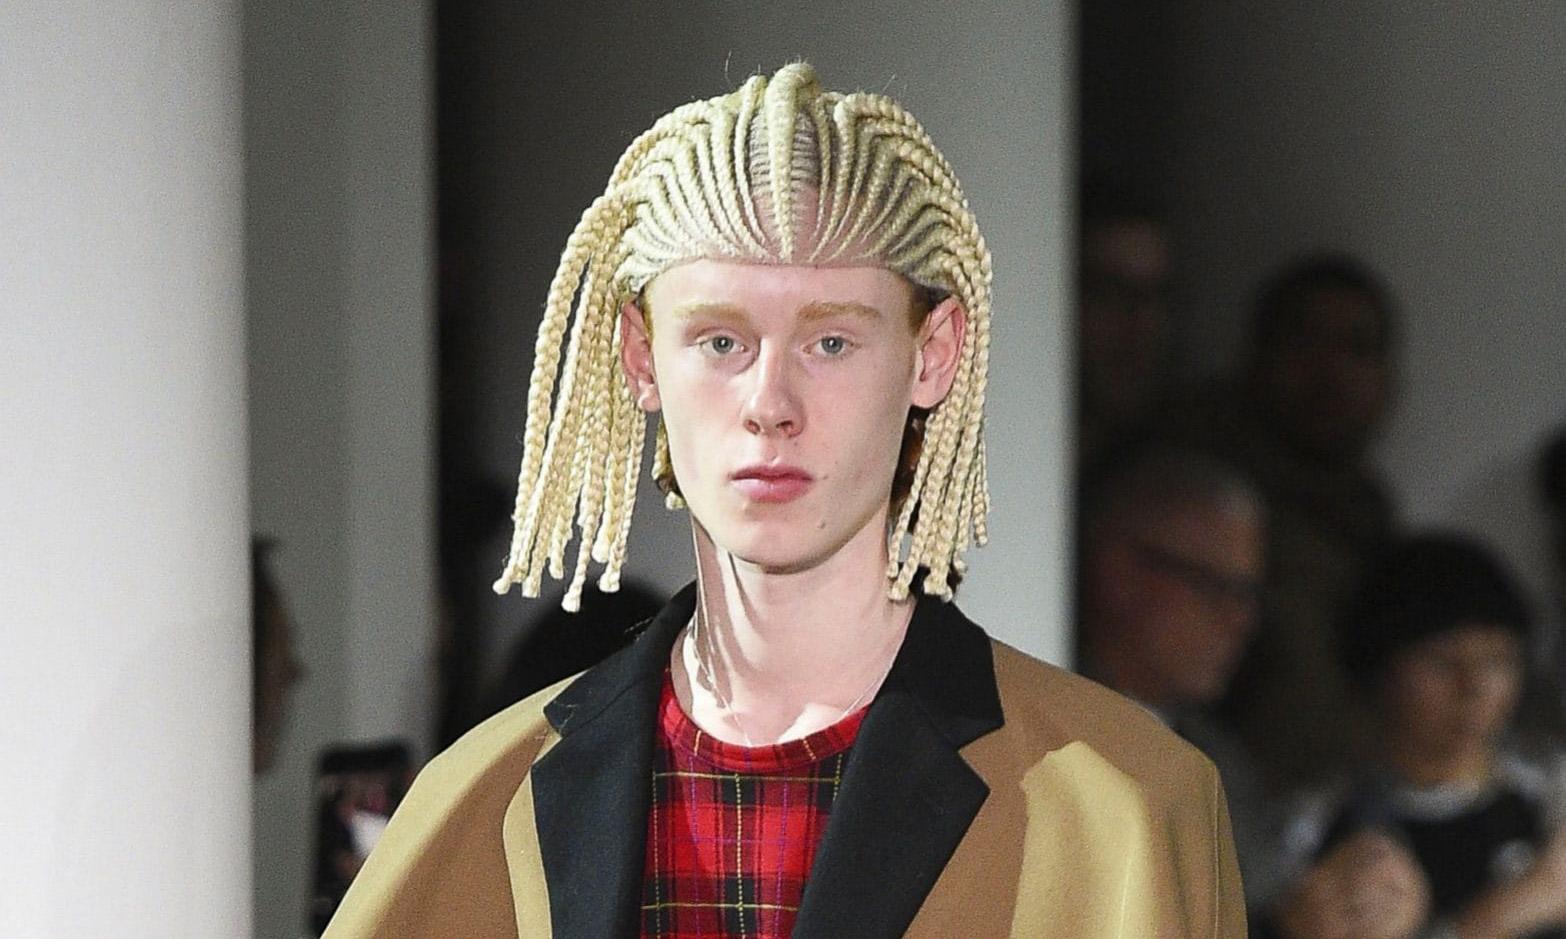 CdG 走秀模特发型被批评不当文化挪用,发型师公开道歉